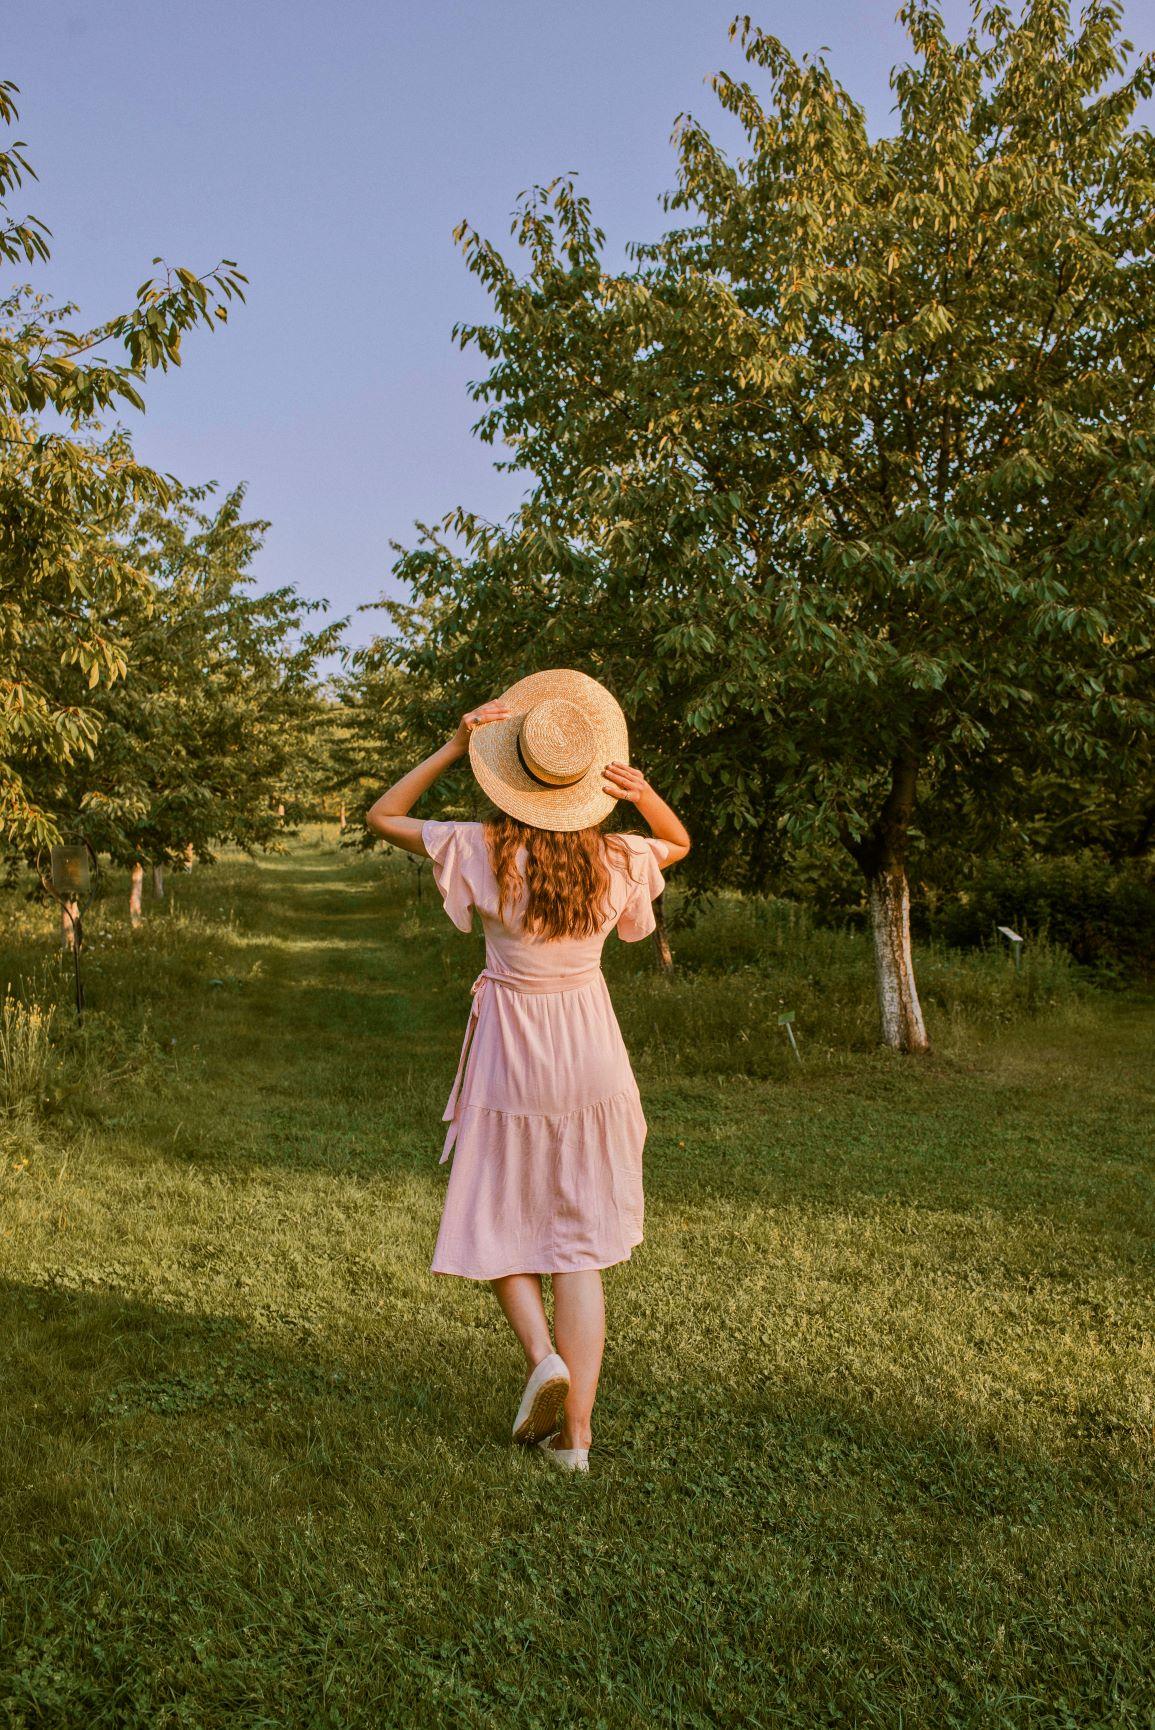 slomkowy kapelusz i sukienka na lato